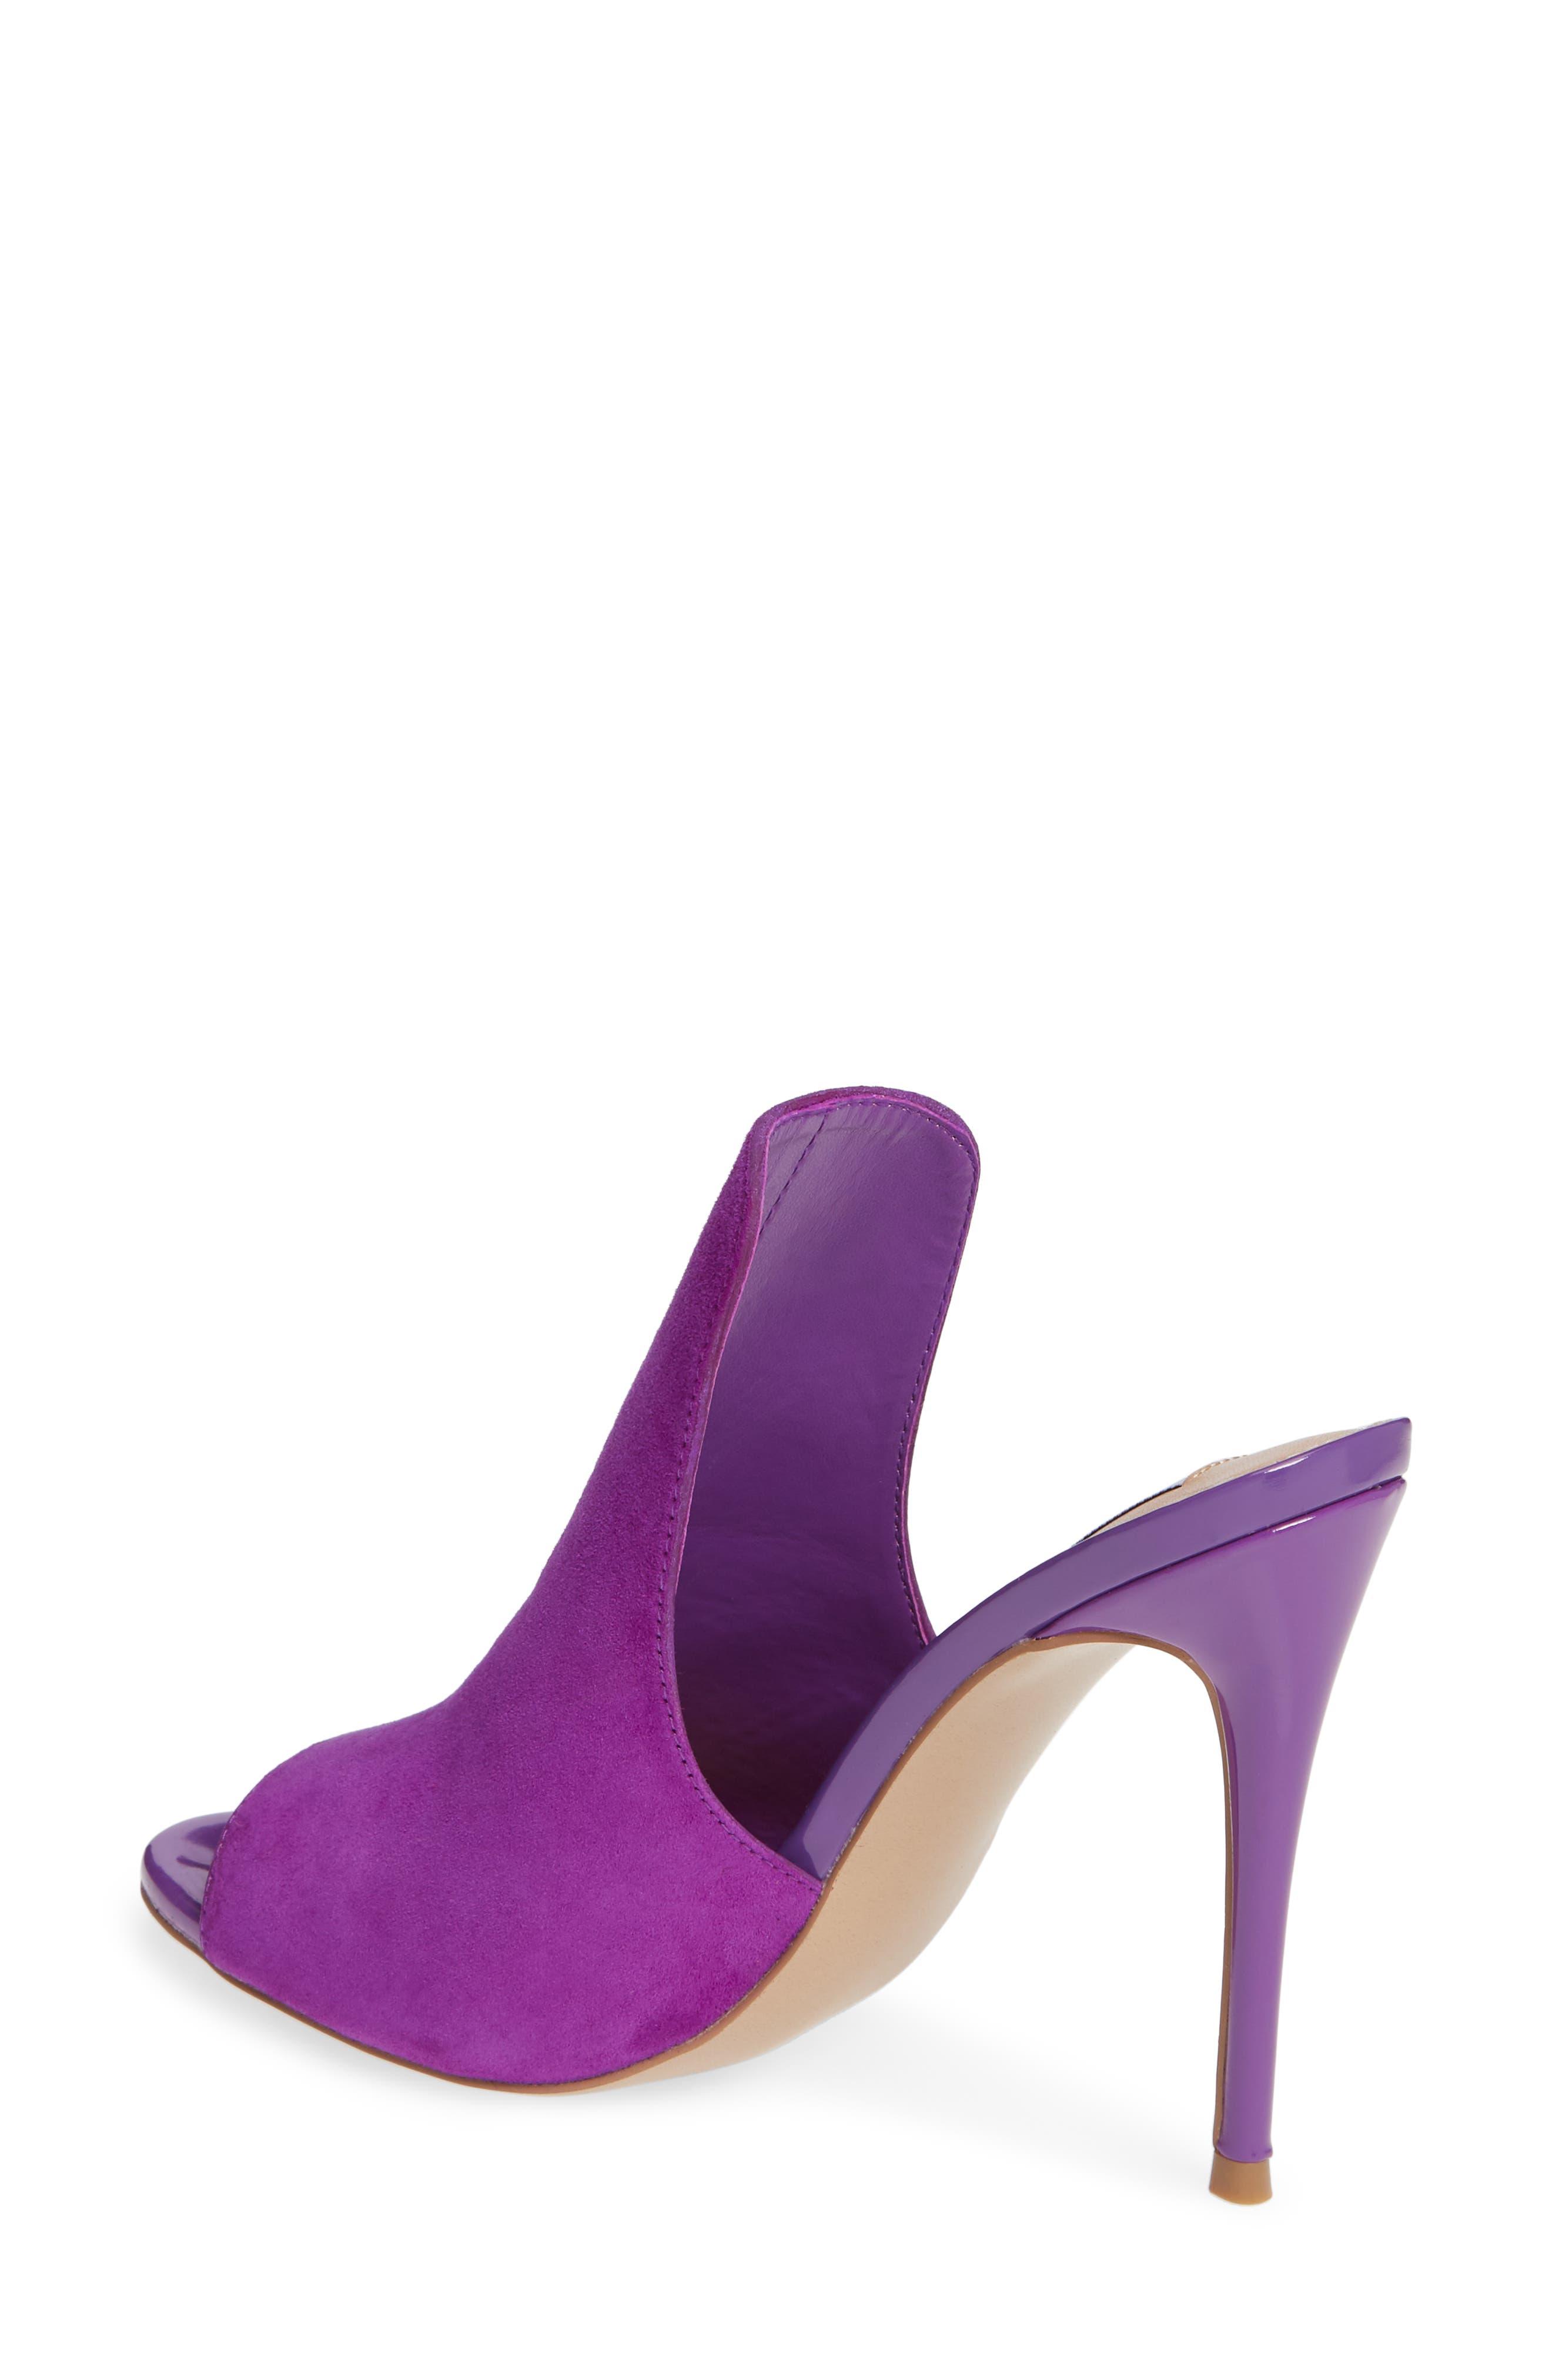 Sinful Sandal,                             Alternate thumbnail 2, color,                             Purple Suede